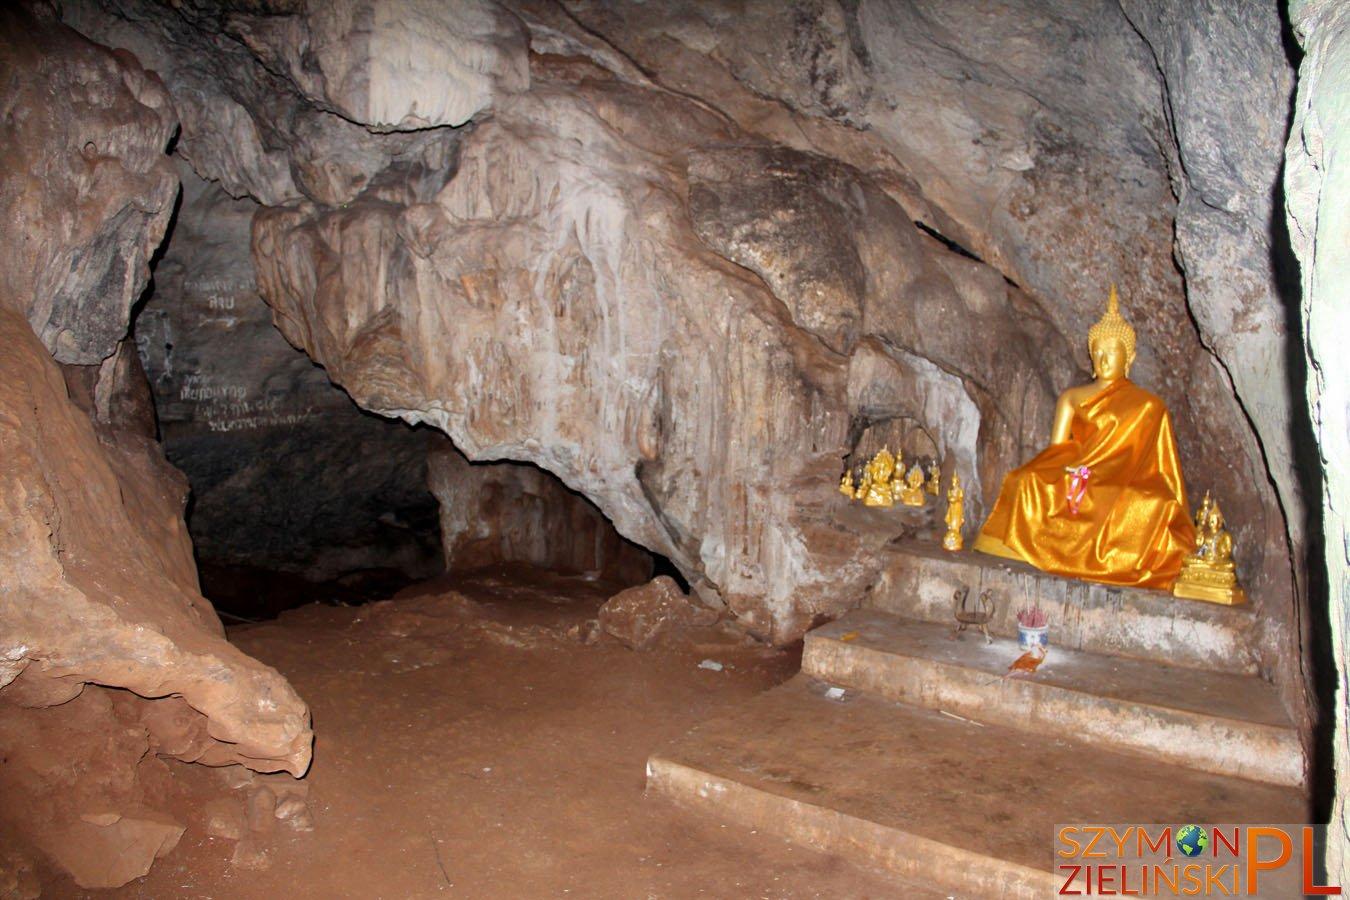 Doi Phahompok, Chiang Mai province, Thailand